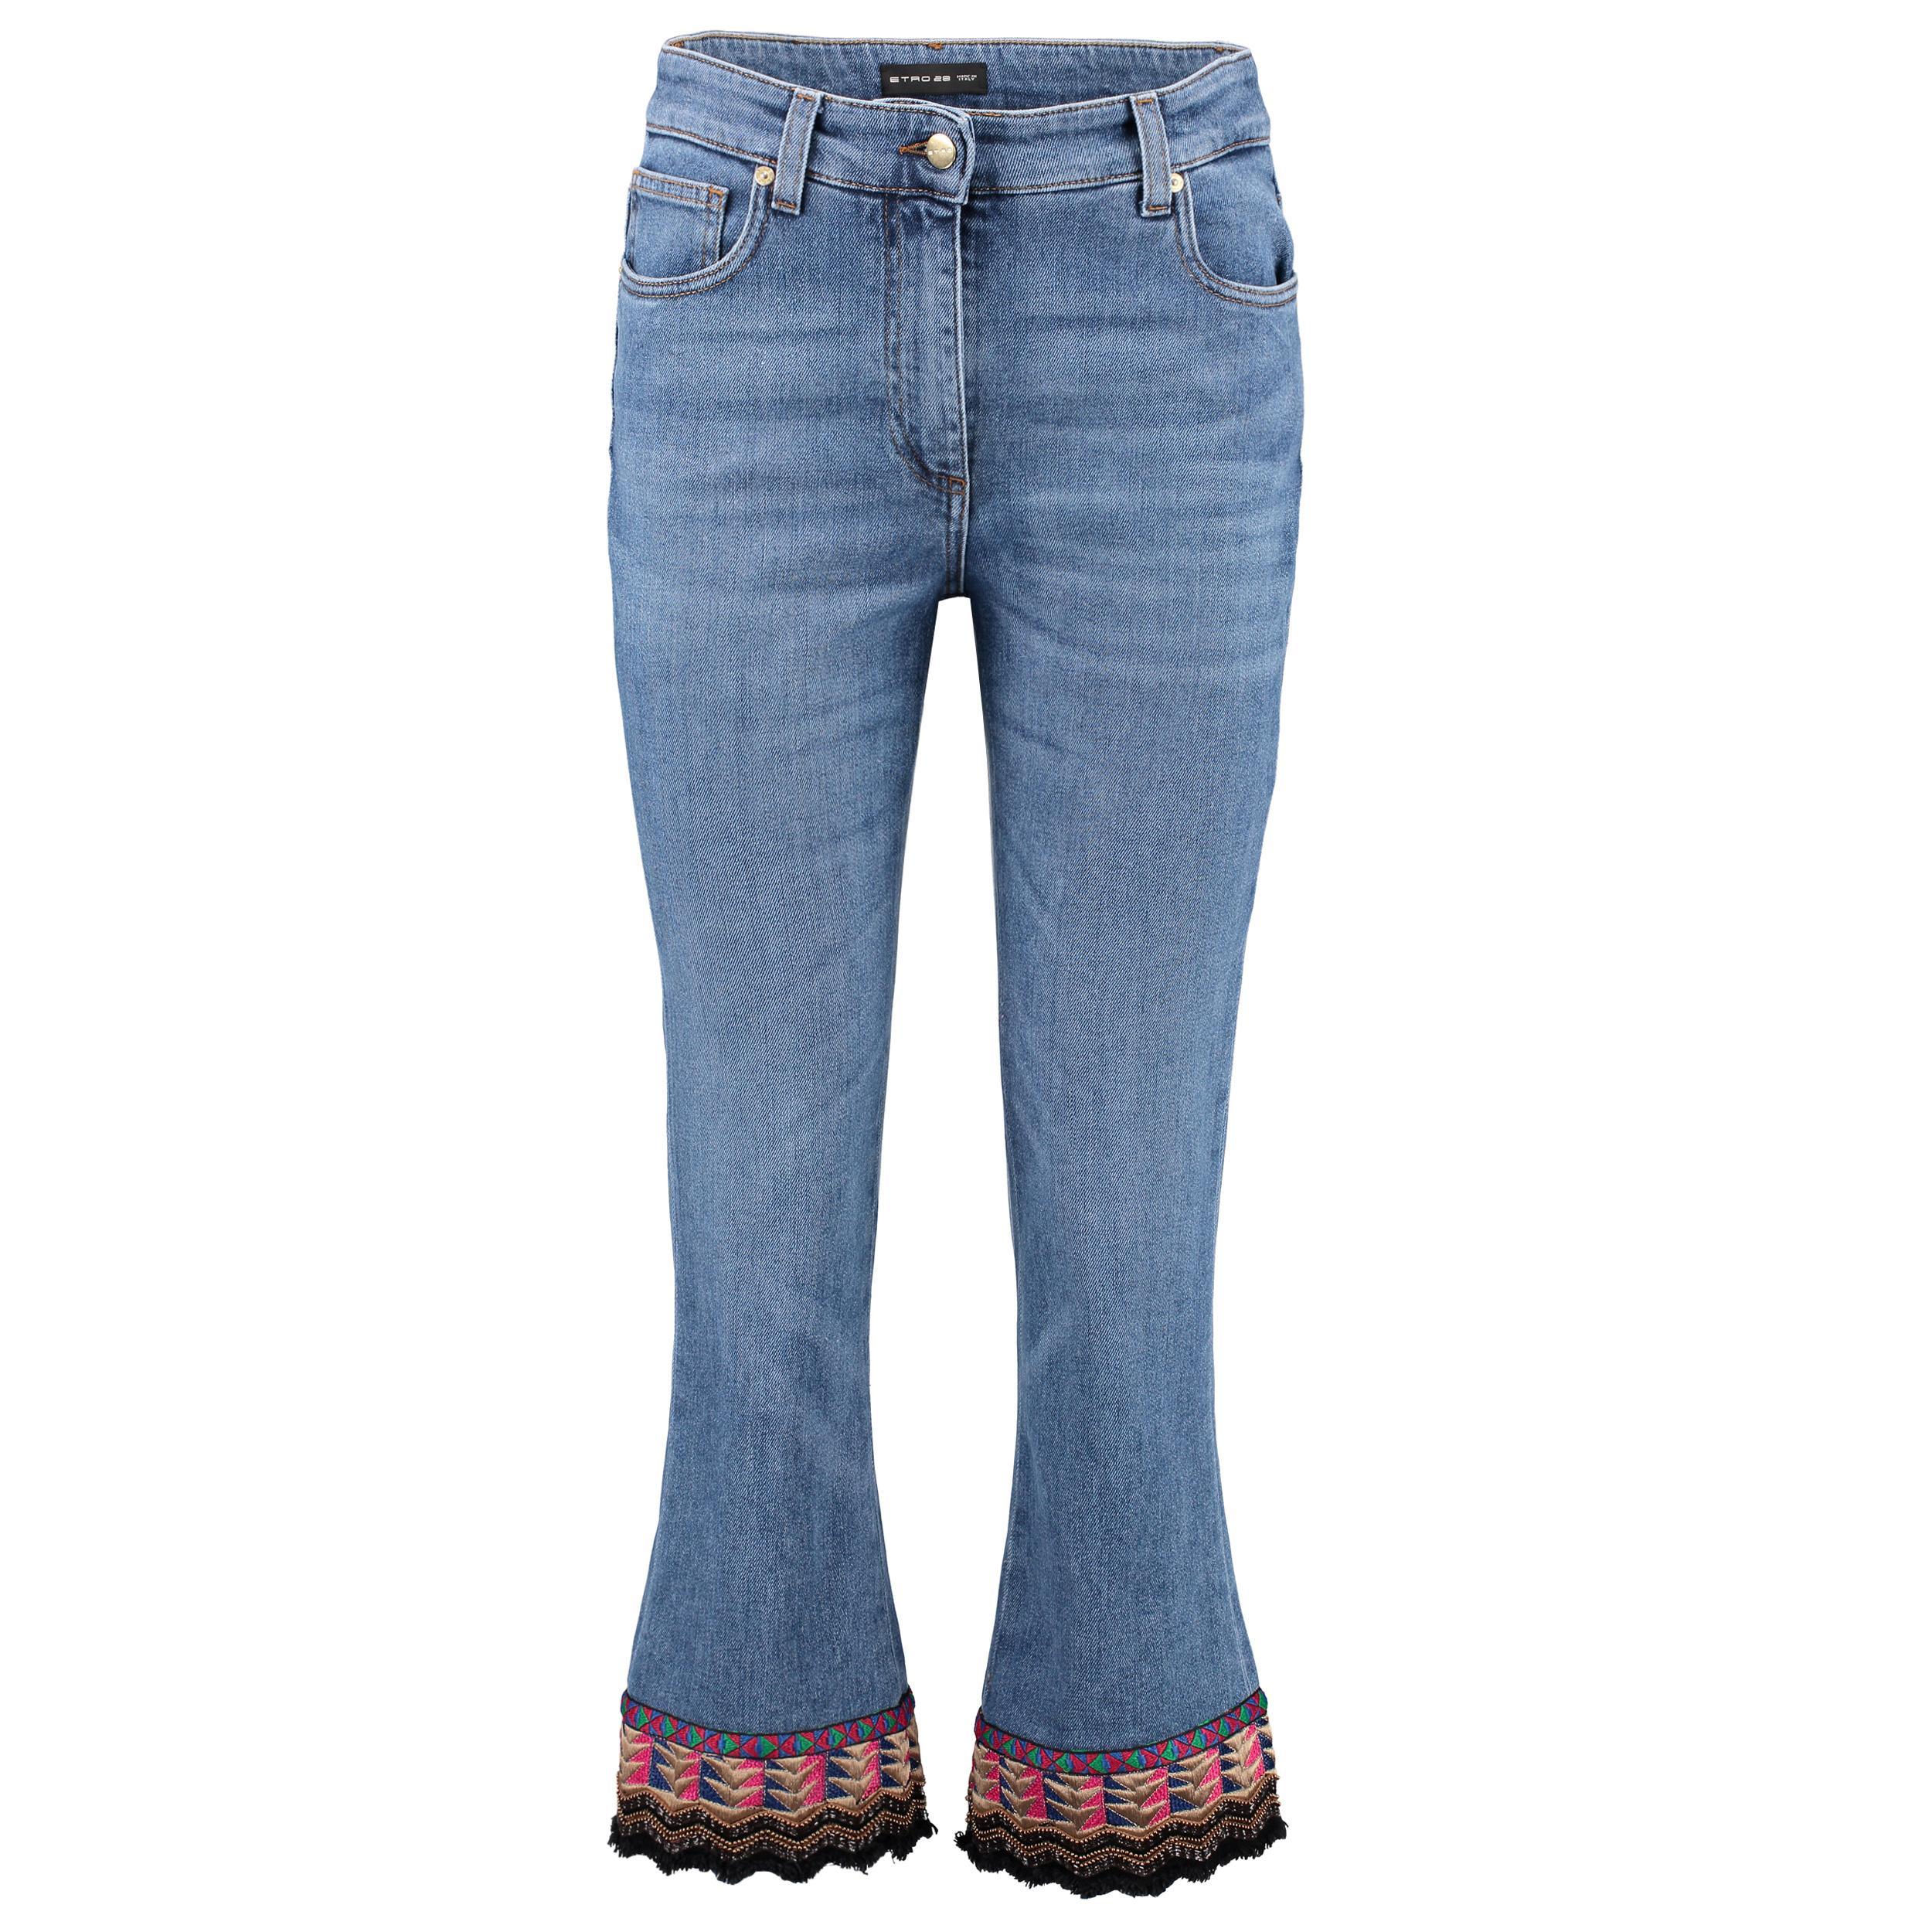 mode bootcut flared jeans damen modehaus schnitzler prinzipalmarkt m nster. Black Bedroom Furniture Sets. Home Design Ideas